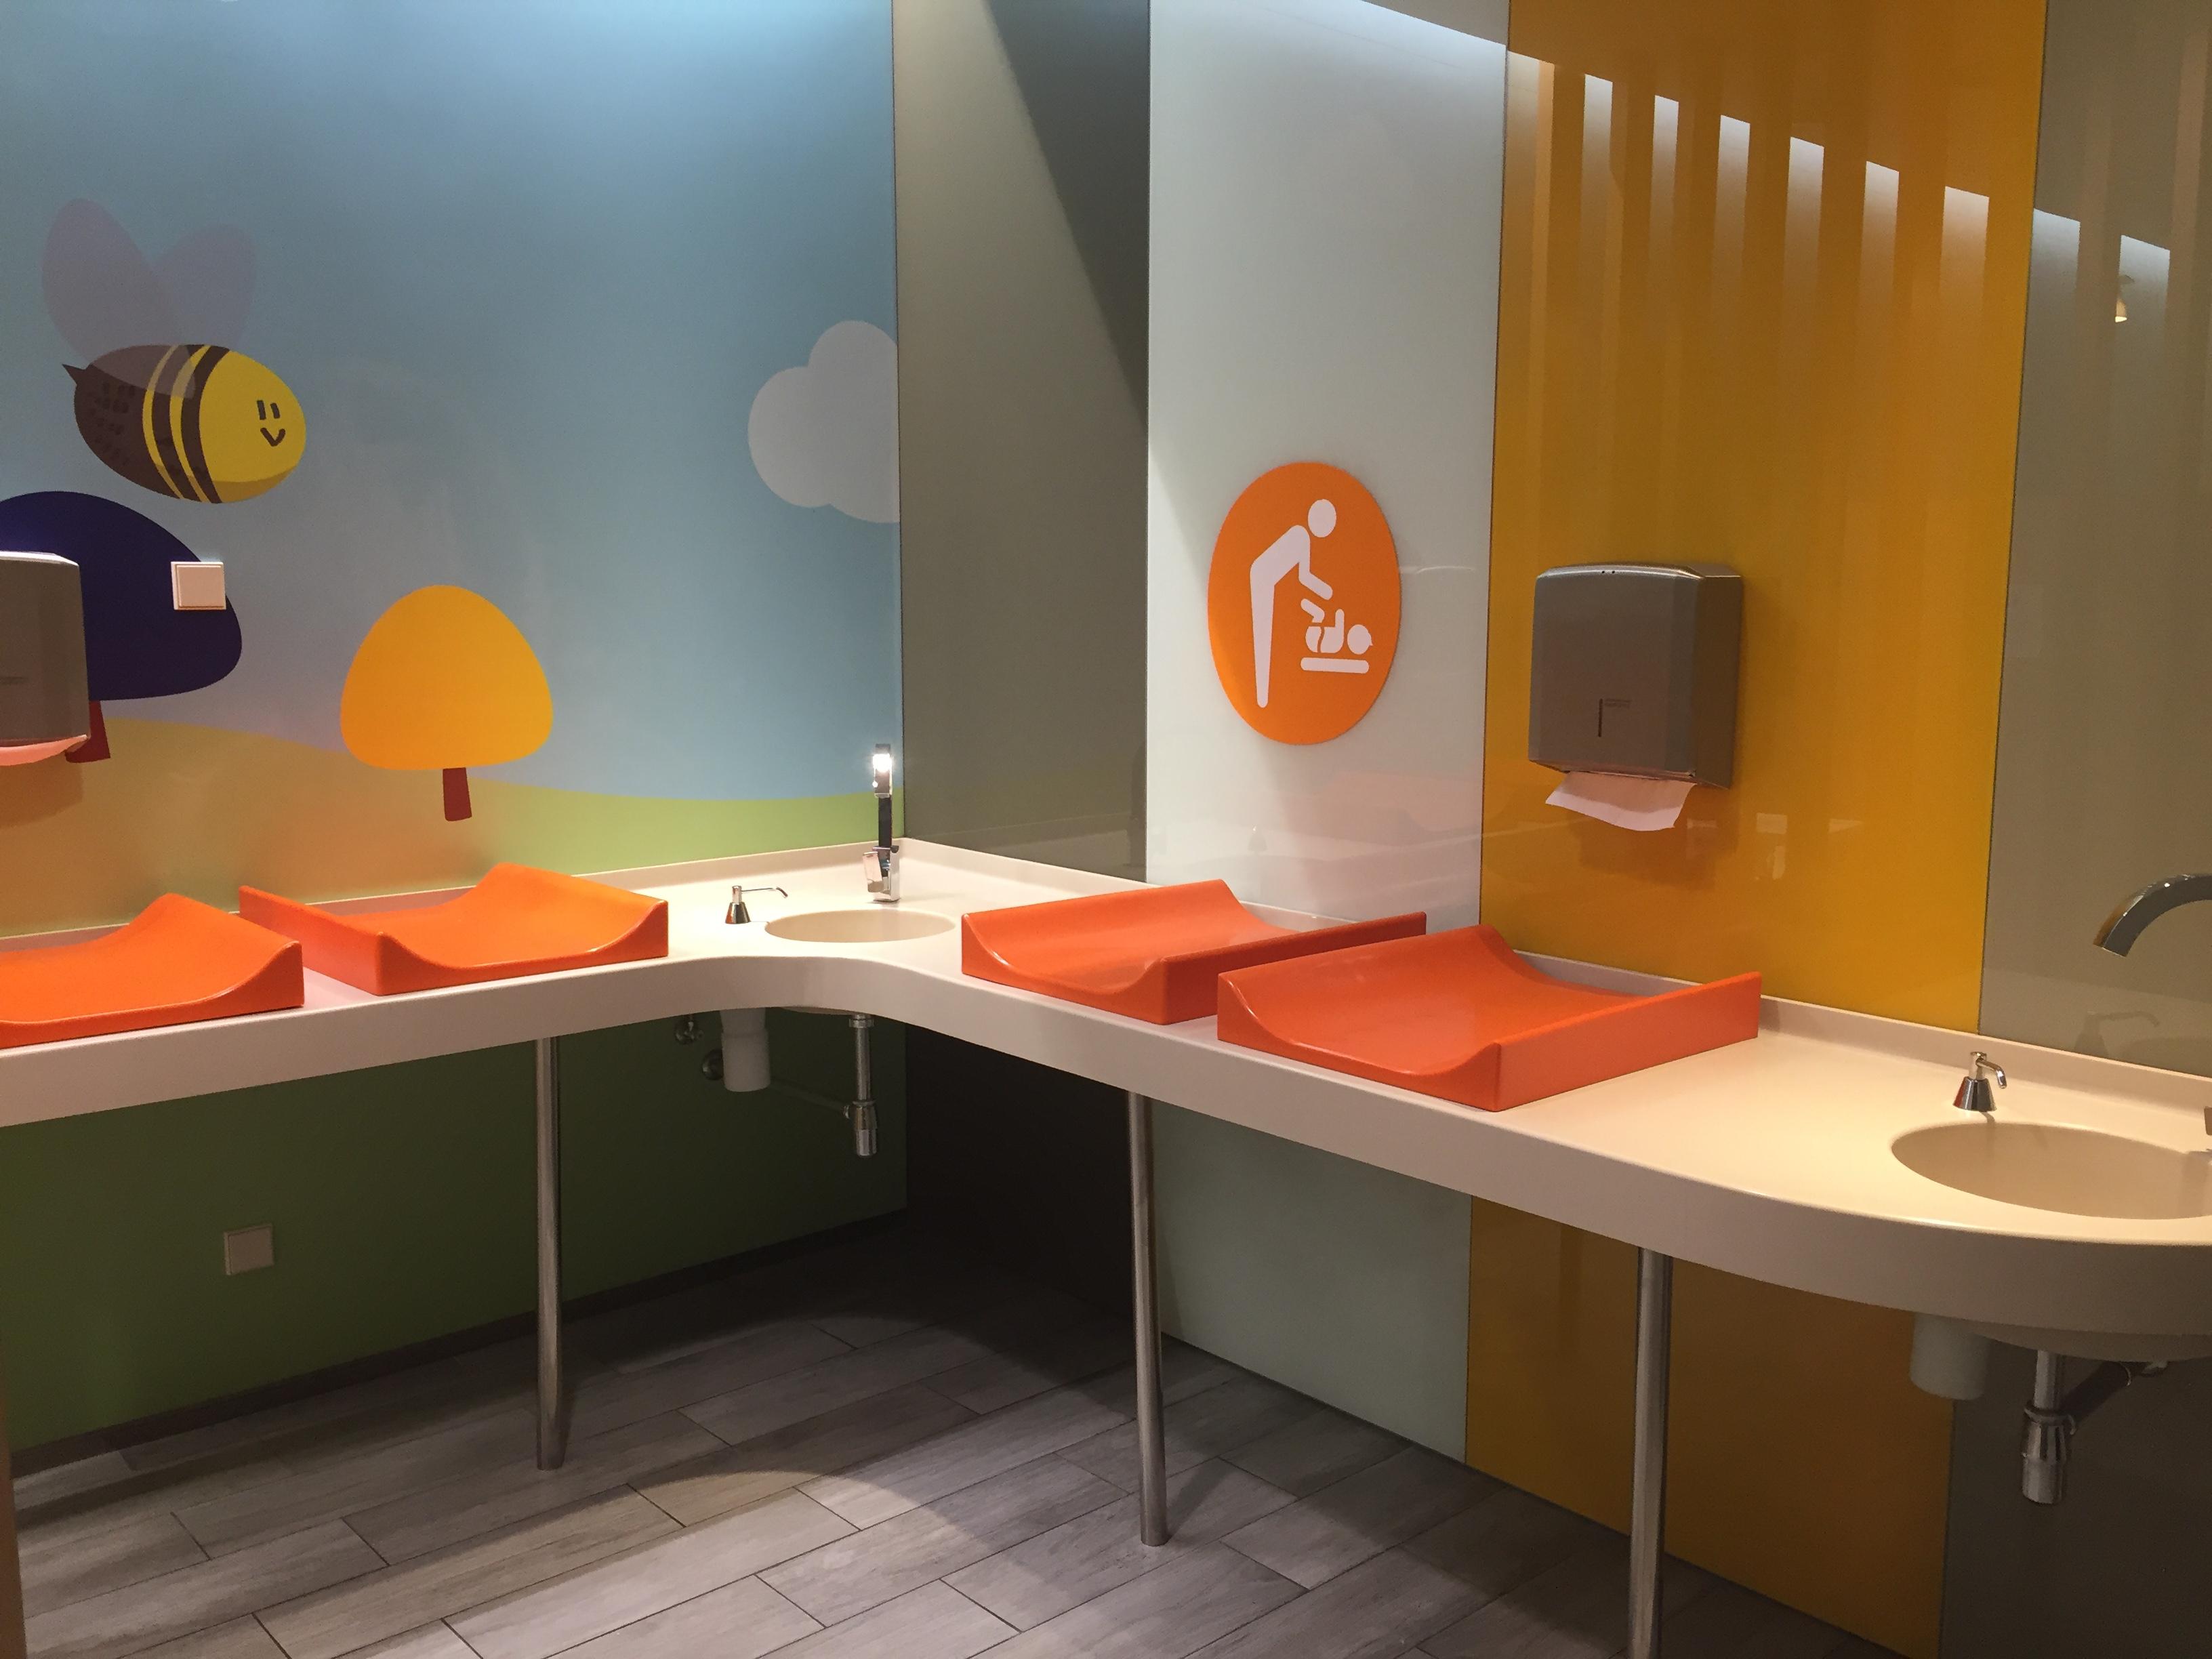 Cambiadores Sala de Lactancia Intu Asturias zona restaurantes